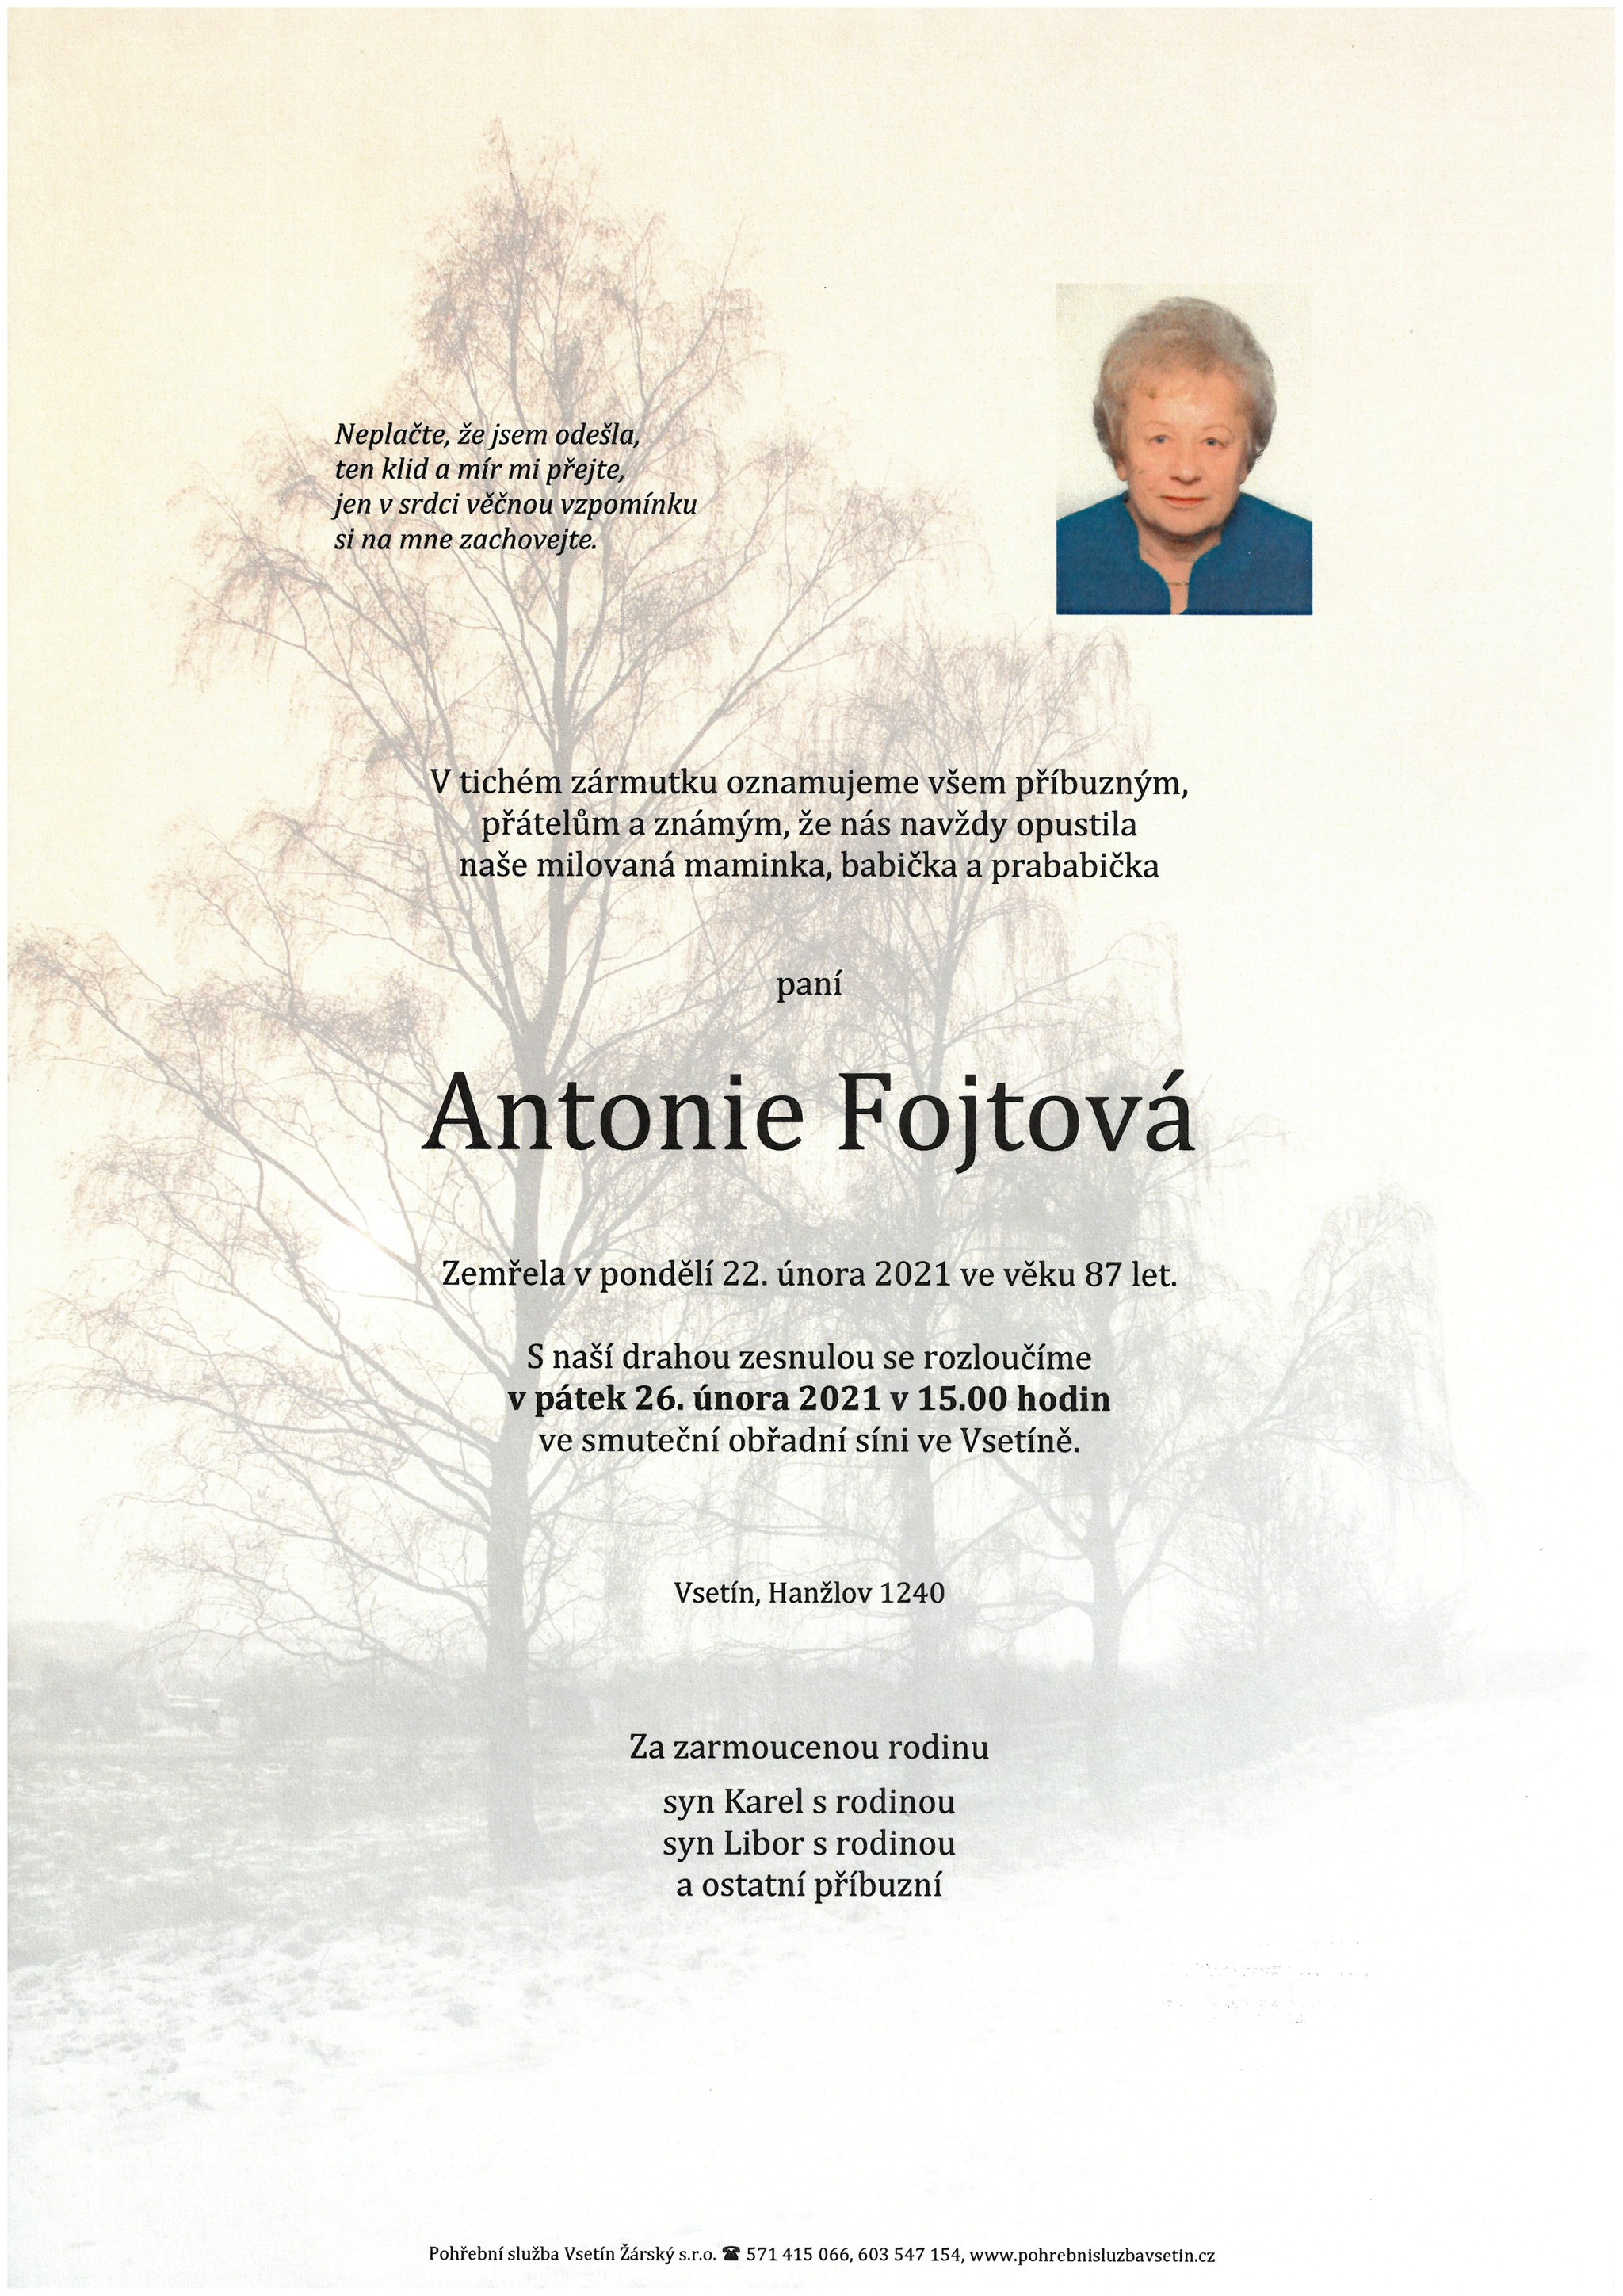 Antonie Fojtová